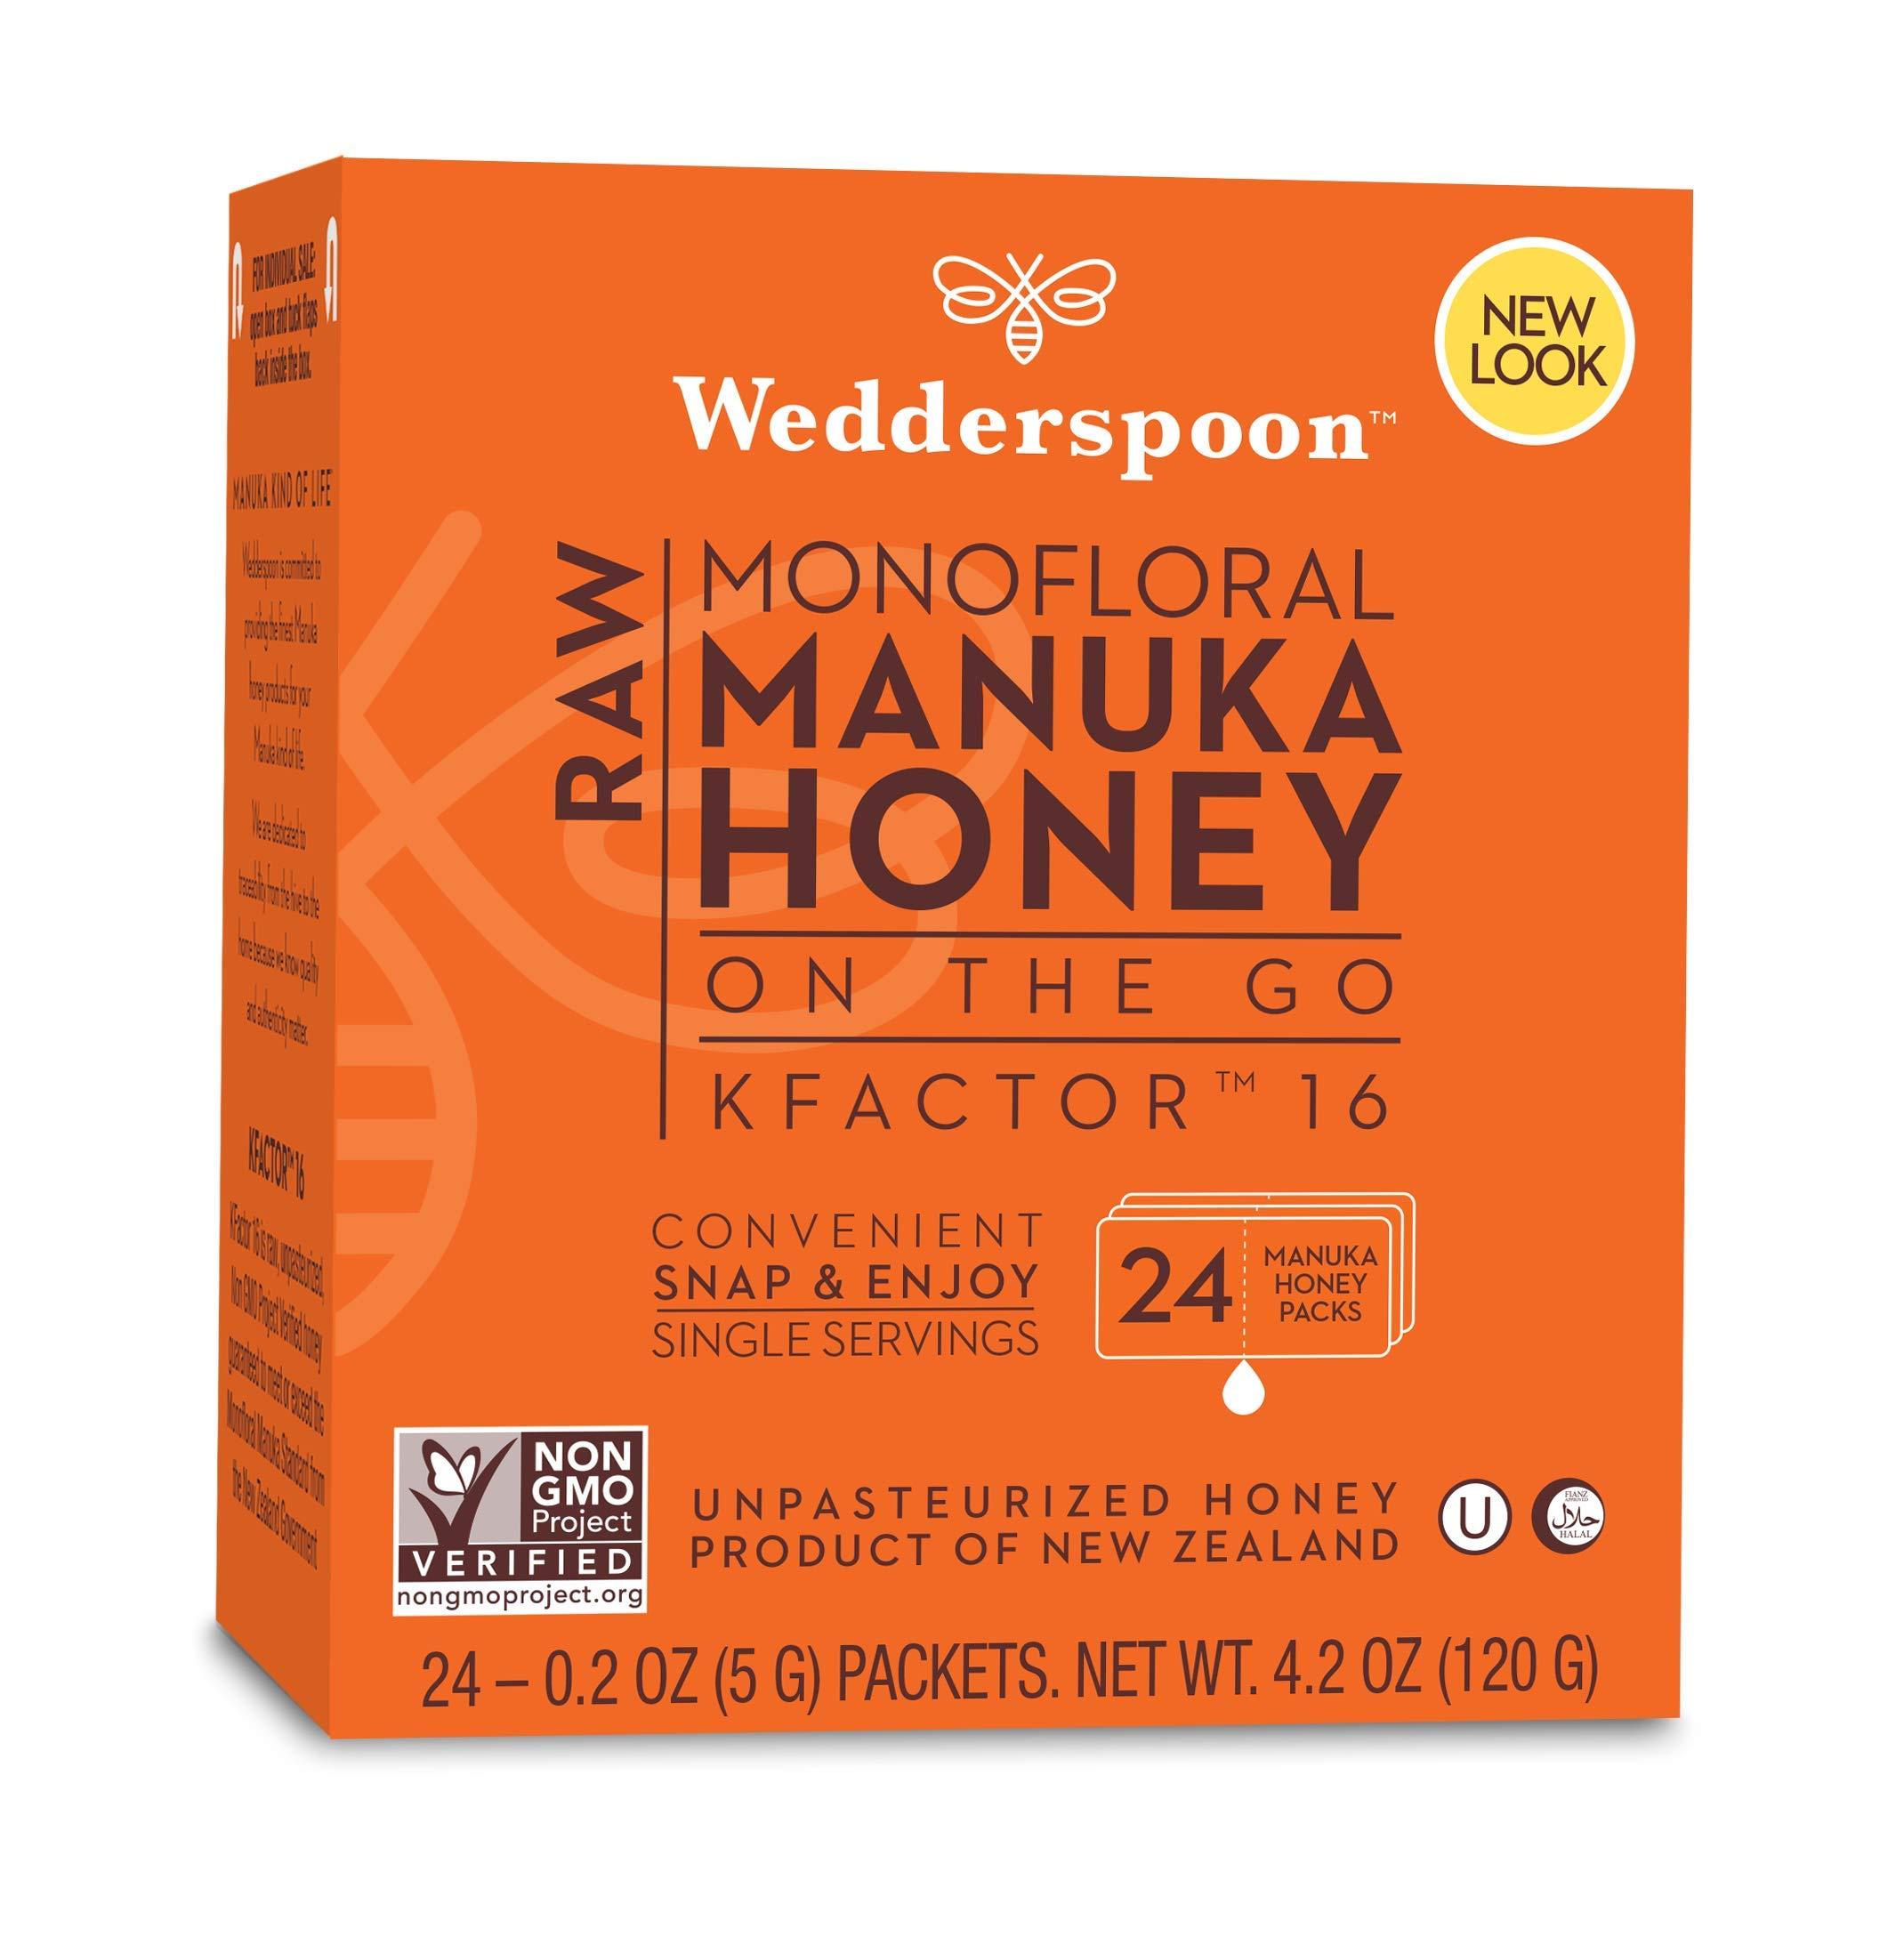 Wedderspoon On The Go Raw Premium Manuka Honey KFactor 16 Packets, 4.0 Oz (24 Count), Unpasteurized, Genuine New Zealand Honey, Multi-Functional, Non-GMO Superfood